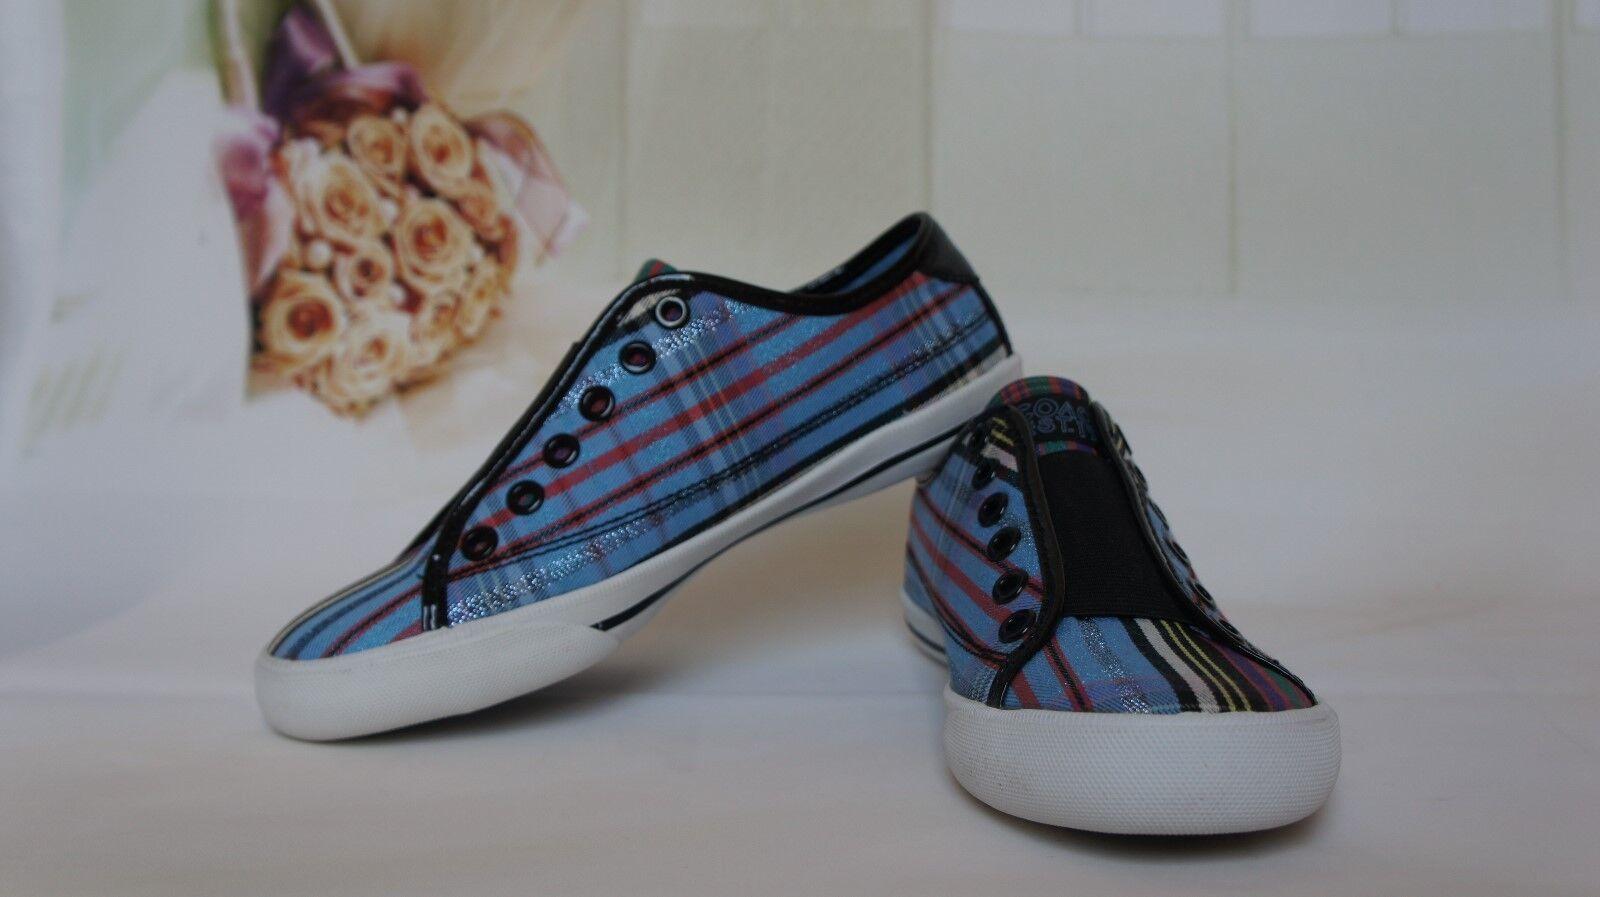 NIB COACH Women's A1595 Blue/Red Tartan Plaid Sneaker shoes Size 6.5